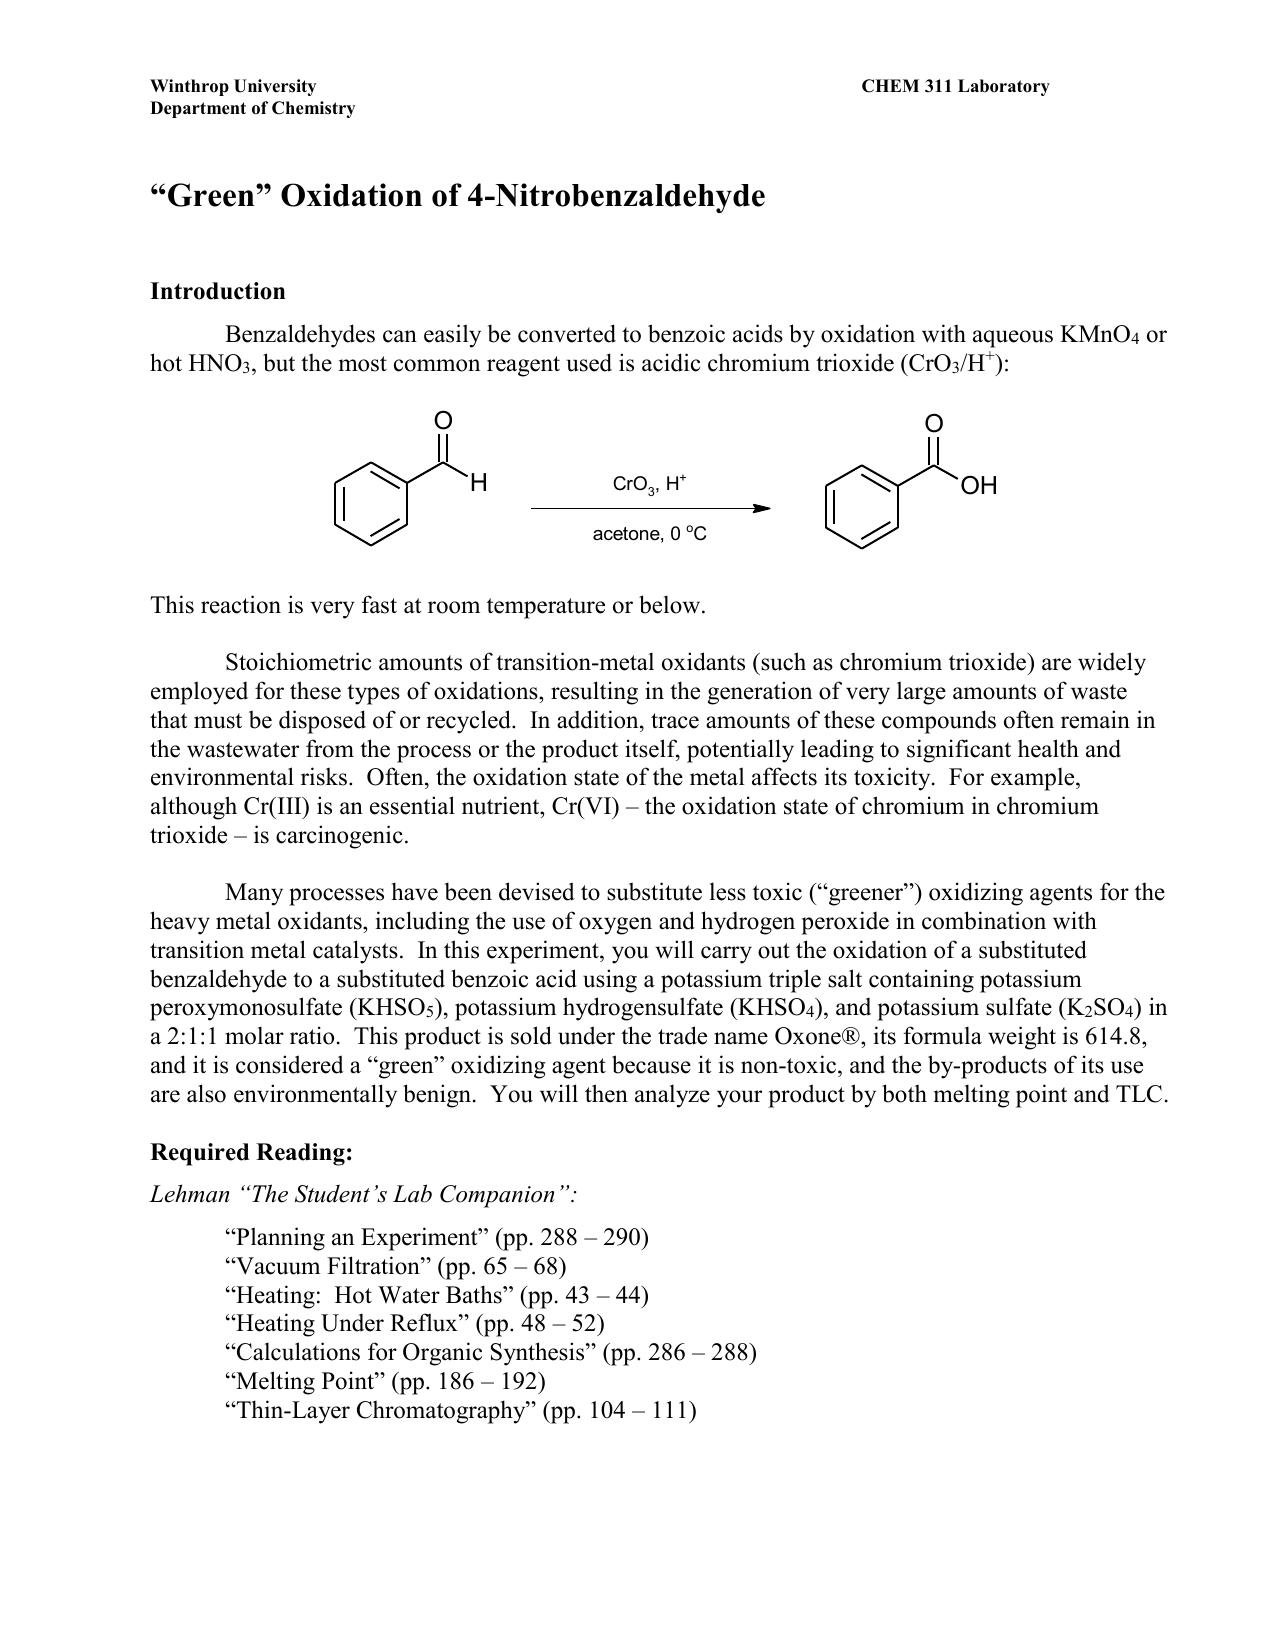 "Green"" Oxidation of 4-Nitrobenzaldehyde"